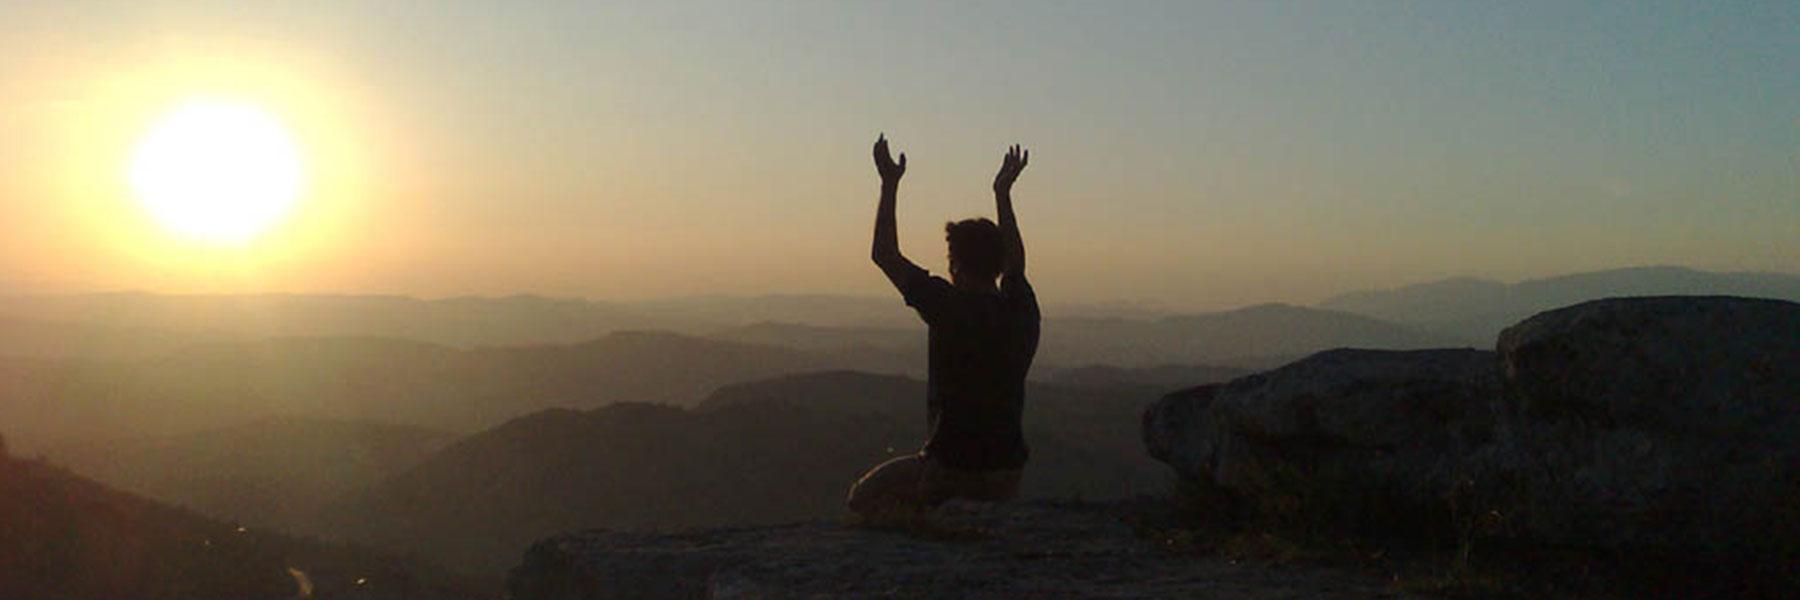 Yoga destroys the individual self